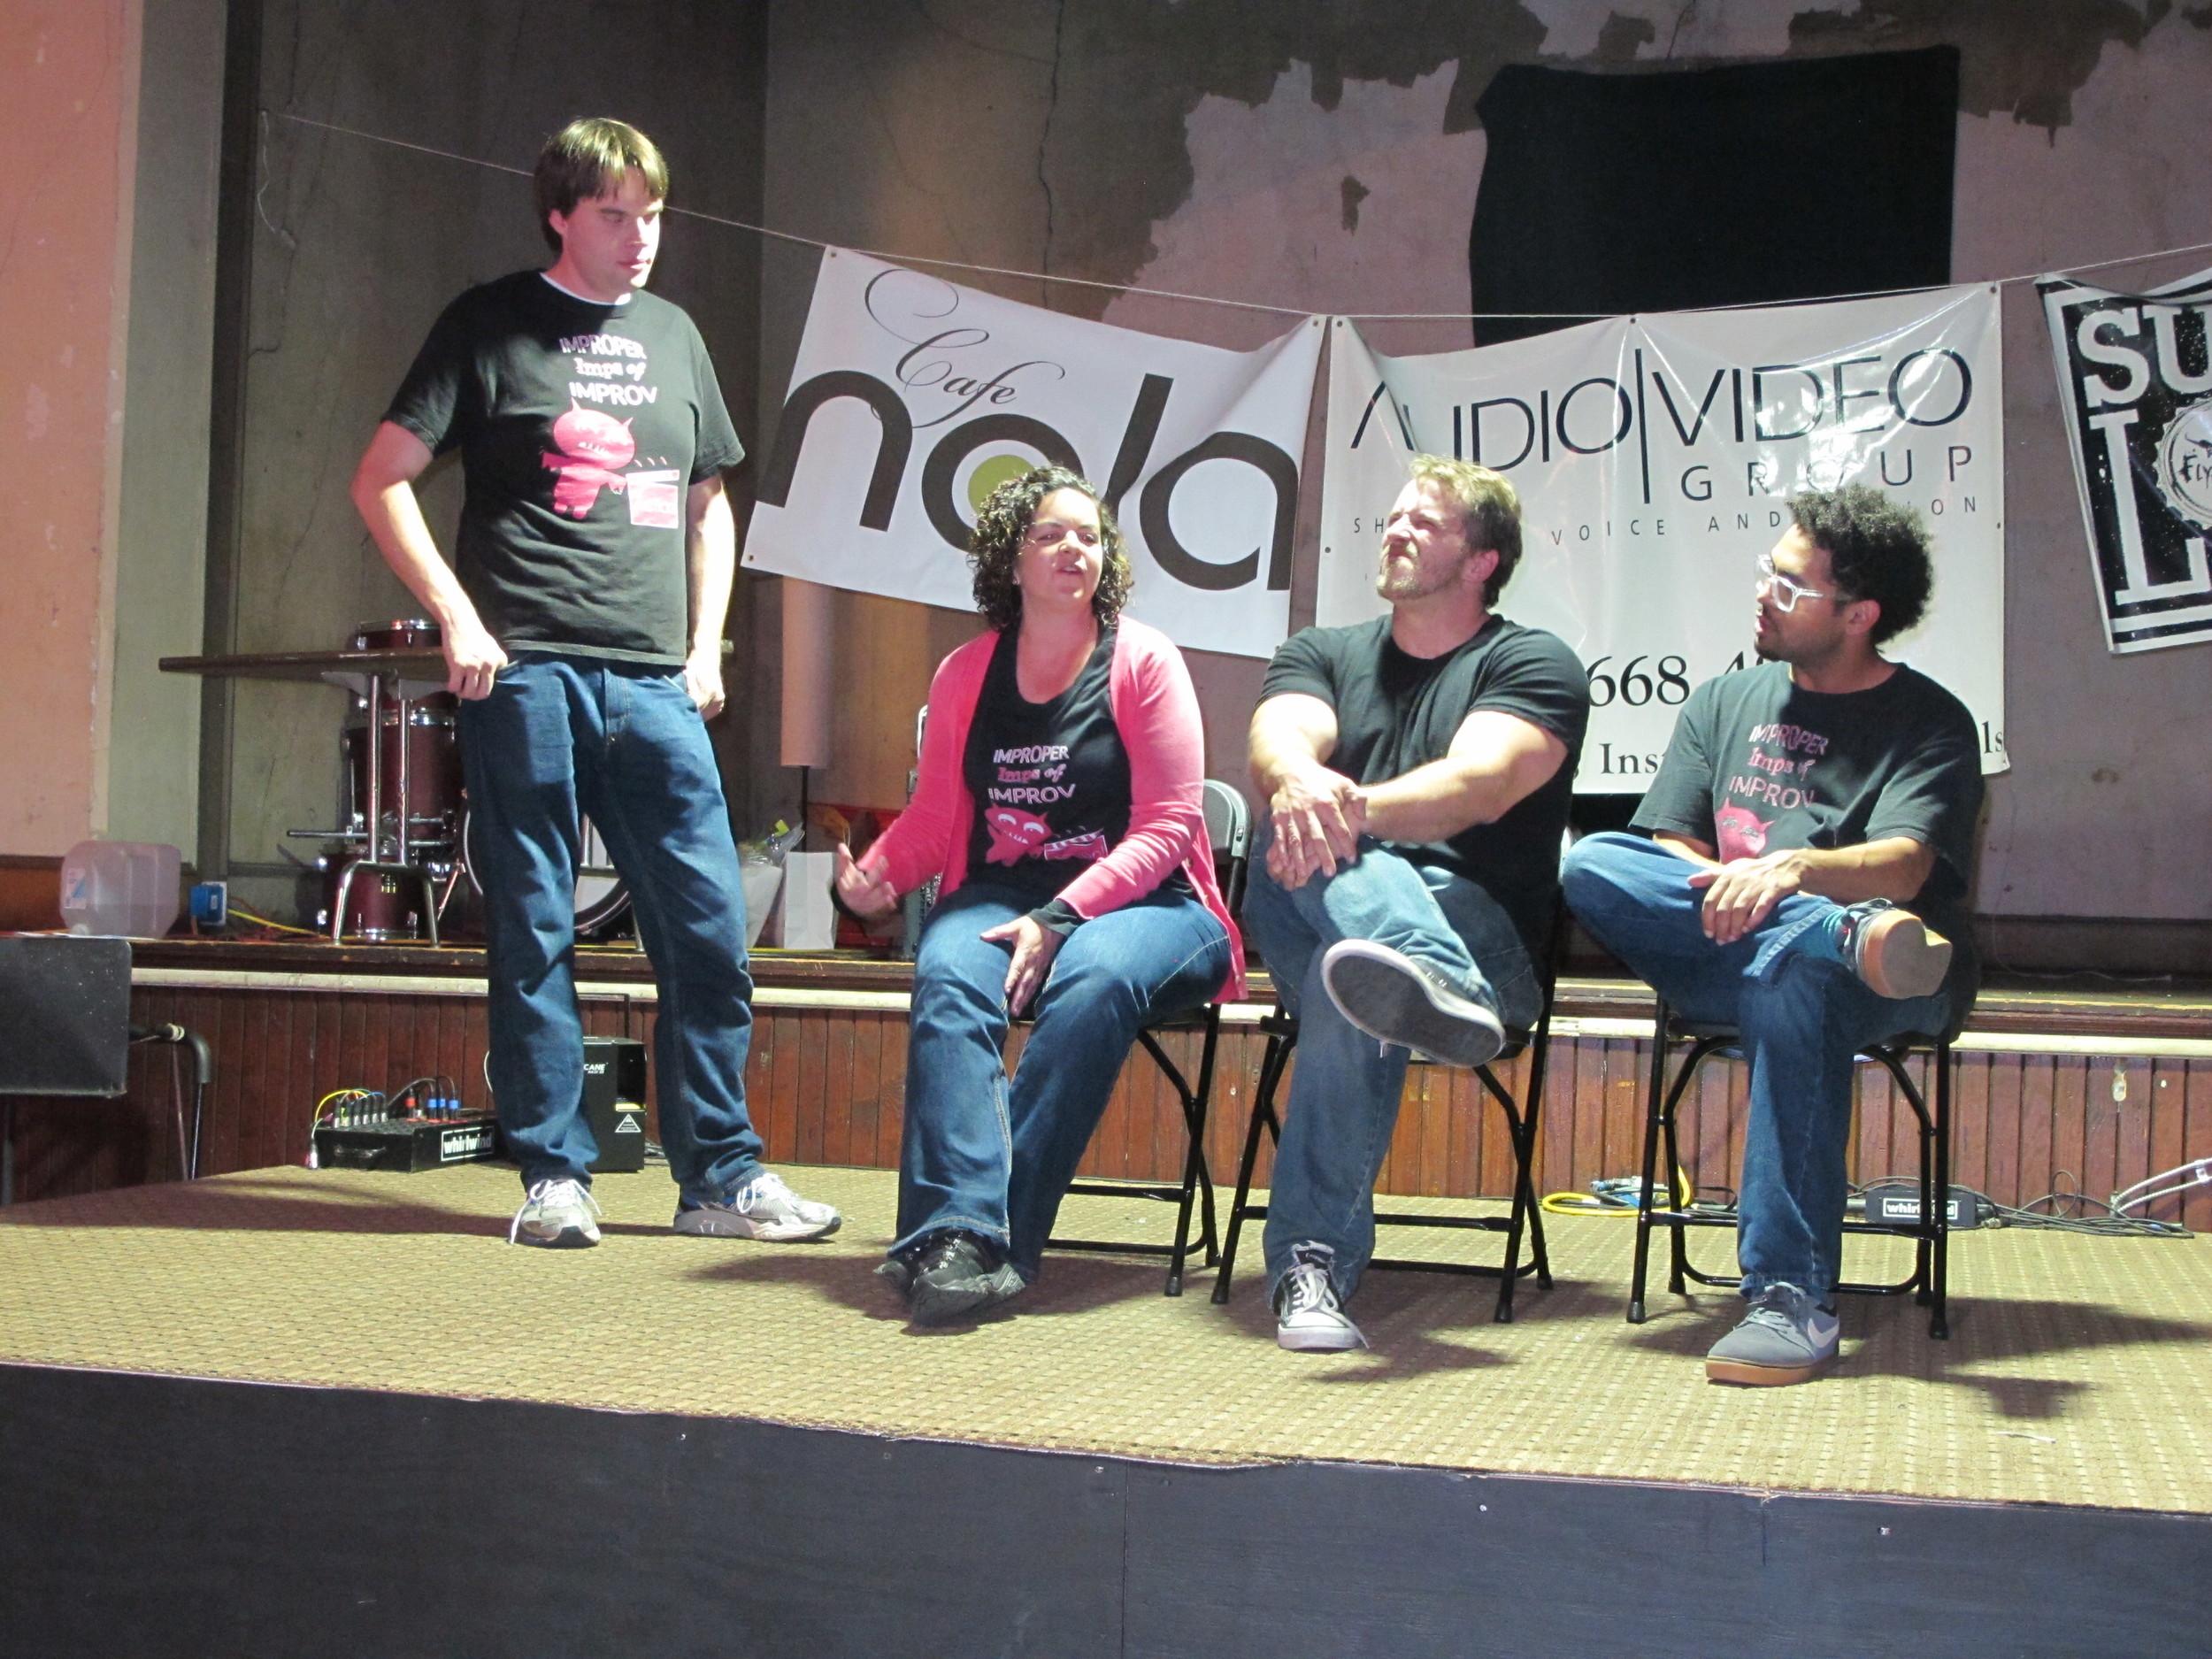 Me, Nate, Jennifer, and Tice playing advice panel.